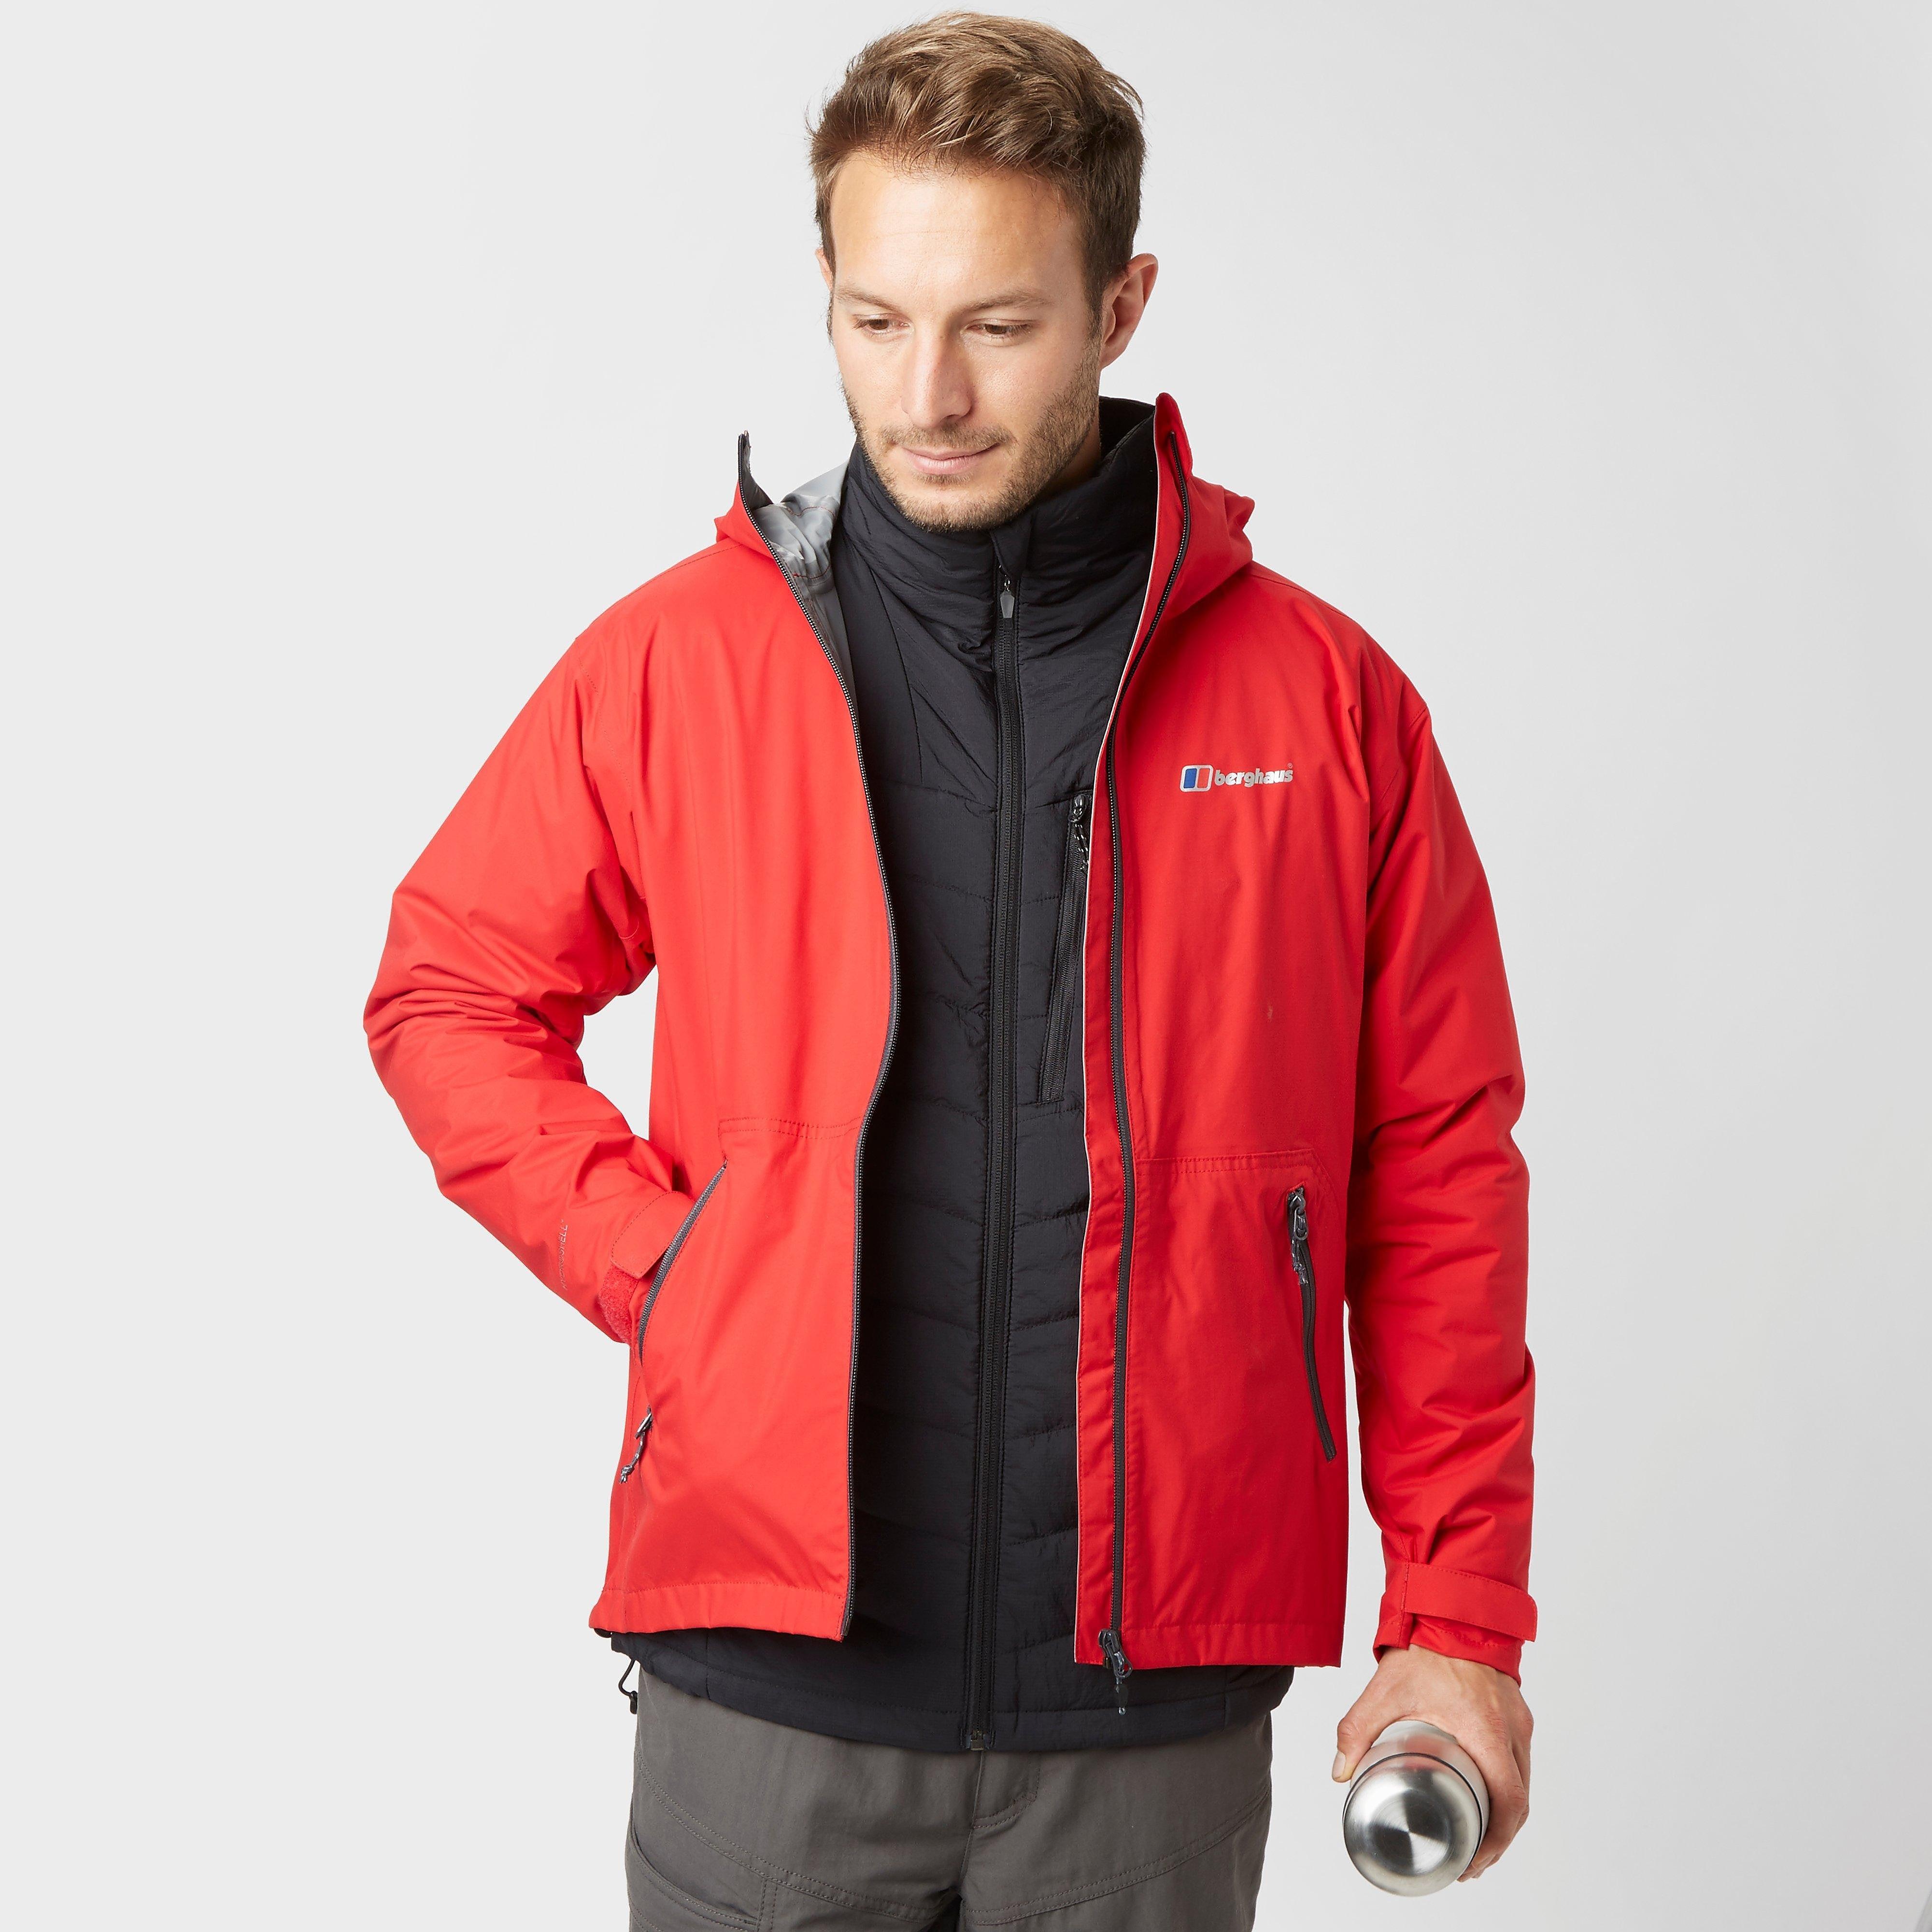 Berghaus Stormcloud Hydroshell Men's Jacket